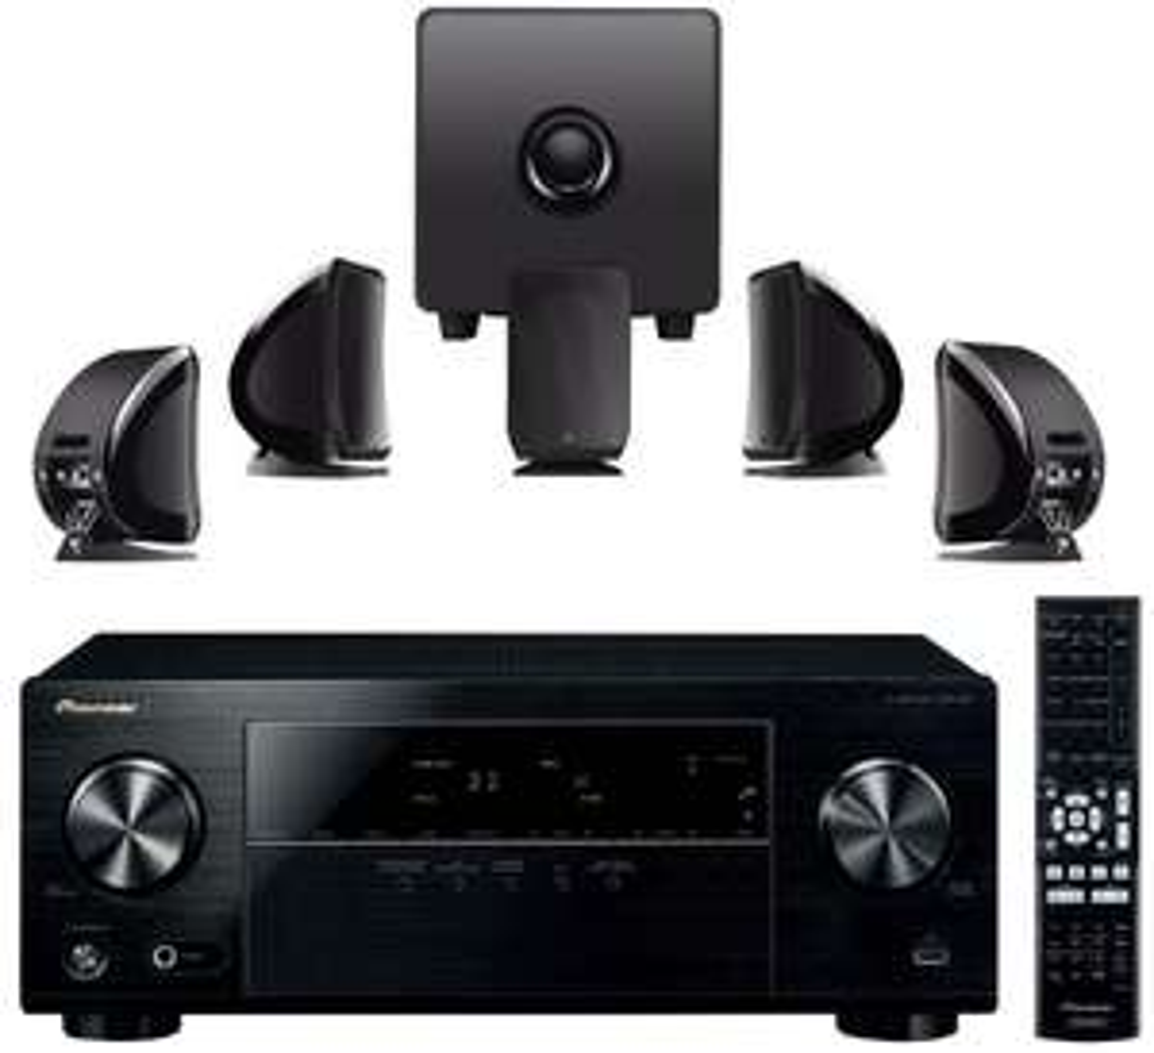 Pack home cinéma Ampli Pioneer VSXS329 + Kit 5.1 Focal Sib and Cub3 Jet Black